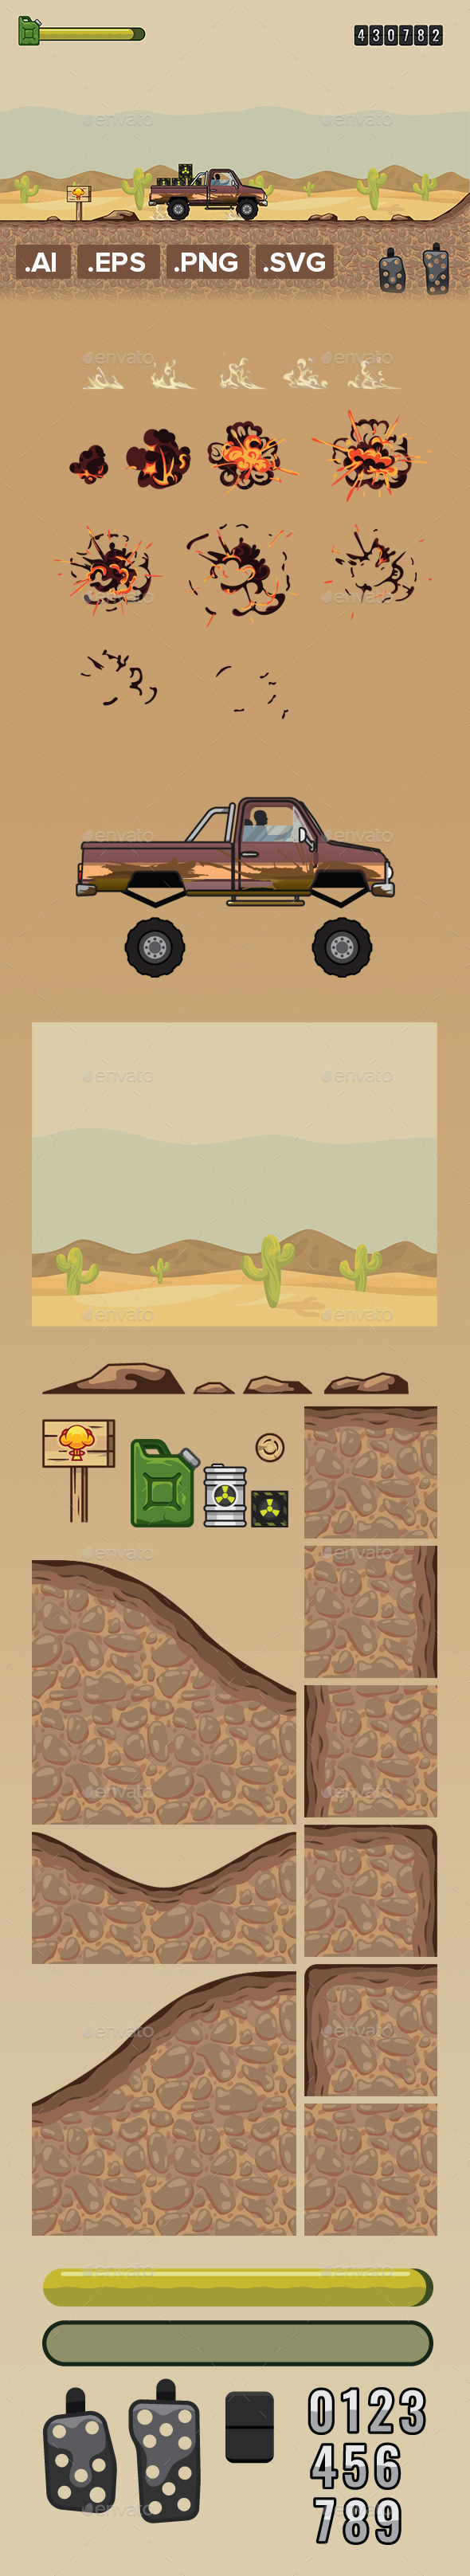 Nuclear Car Asset Tileset Game Kit Runner - Game Kits Game Assets